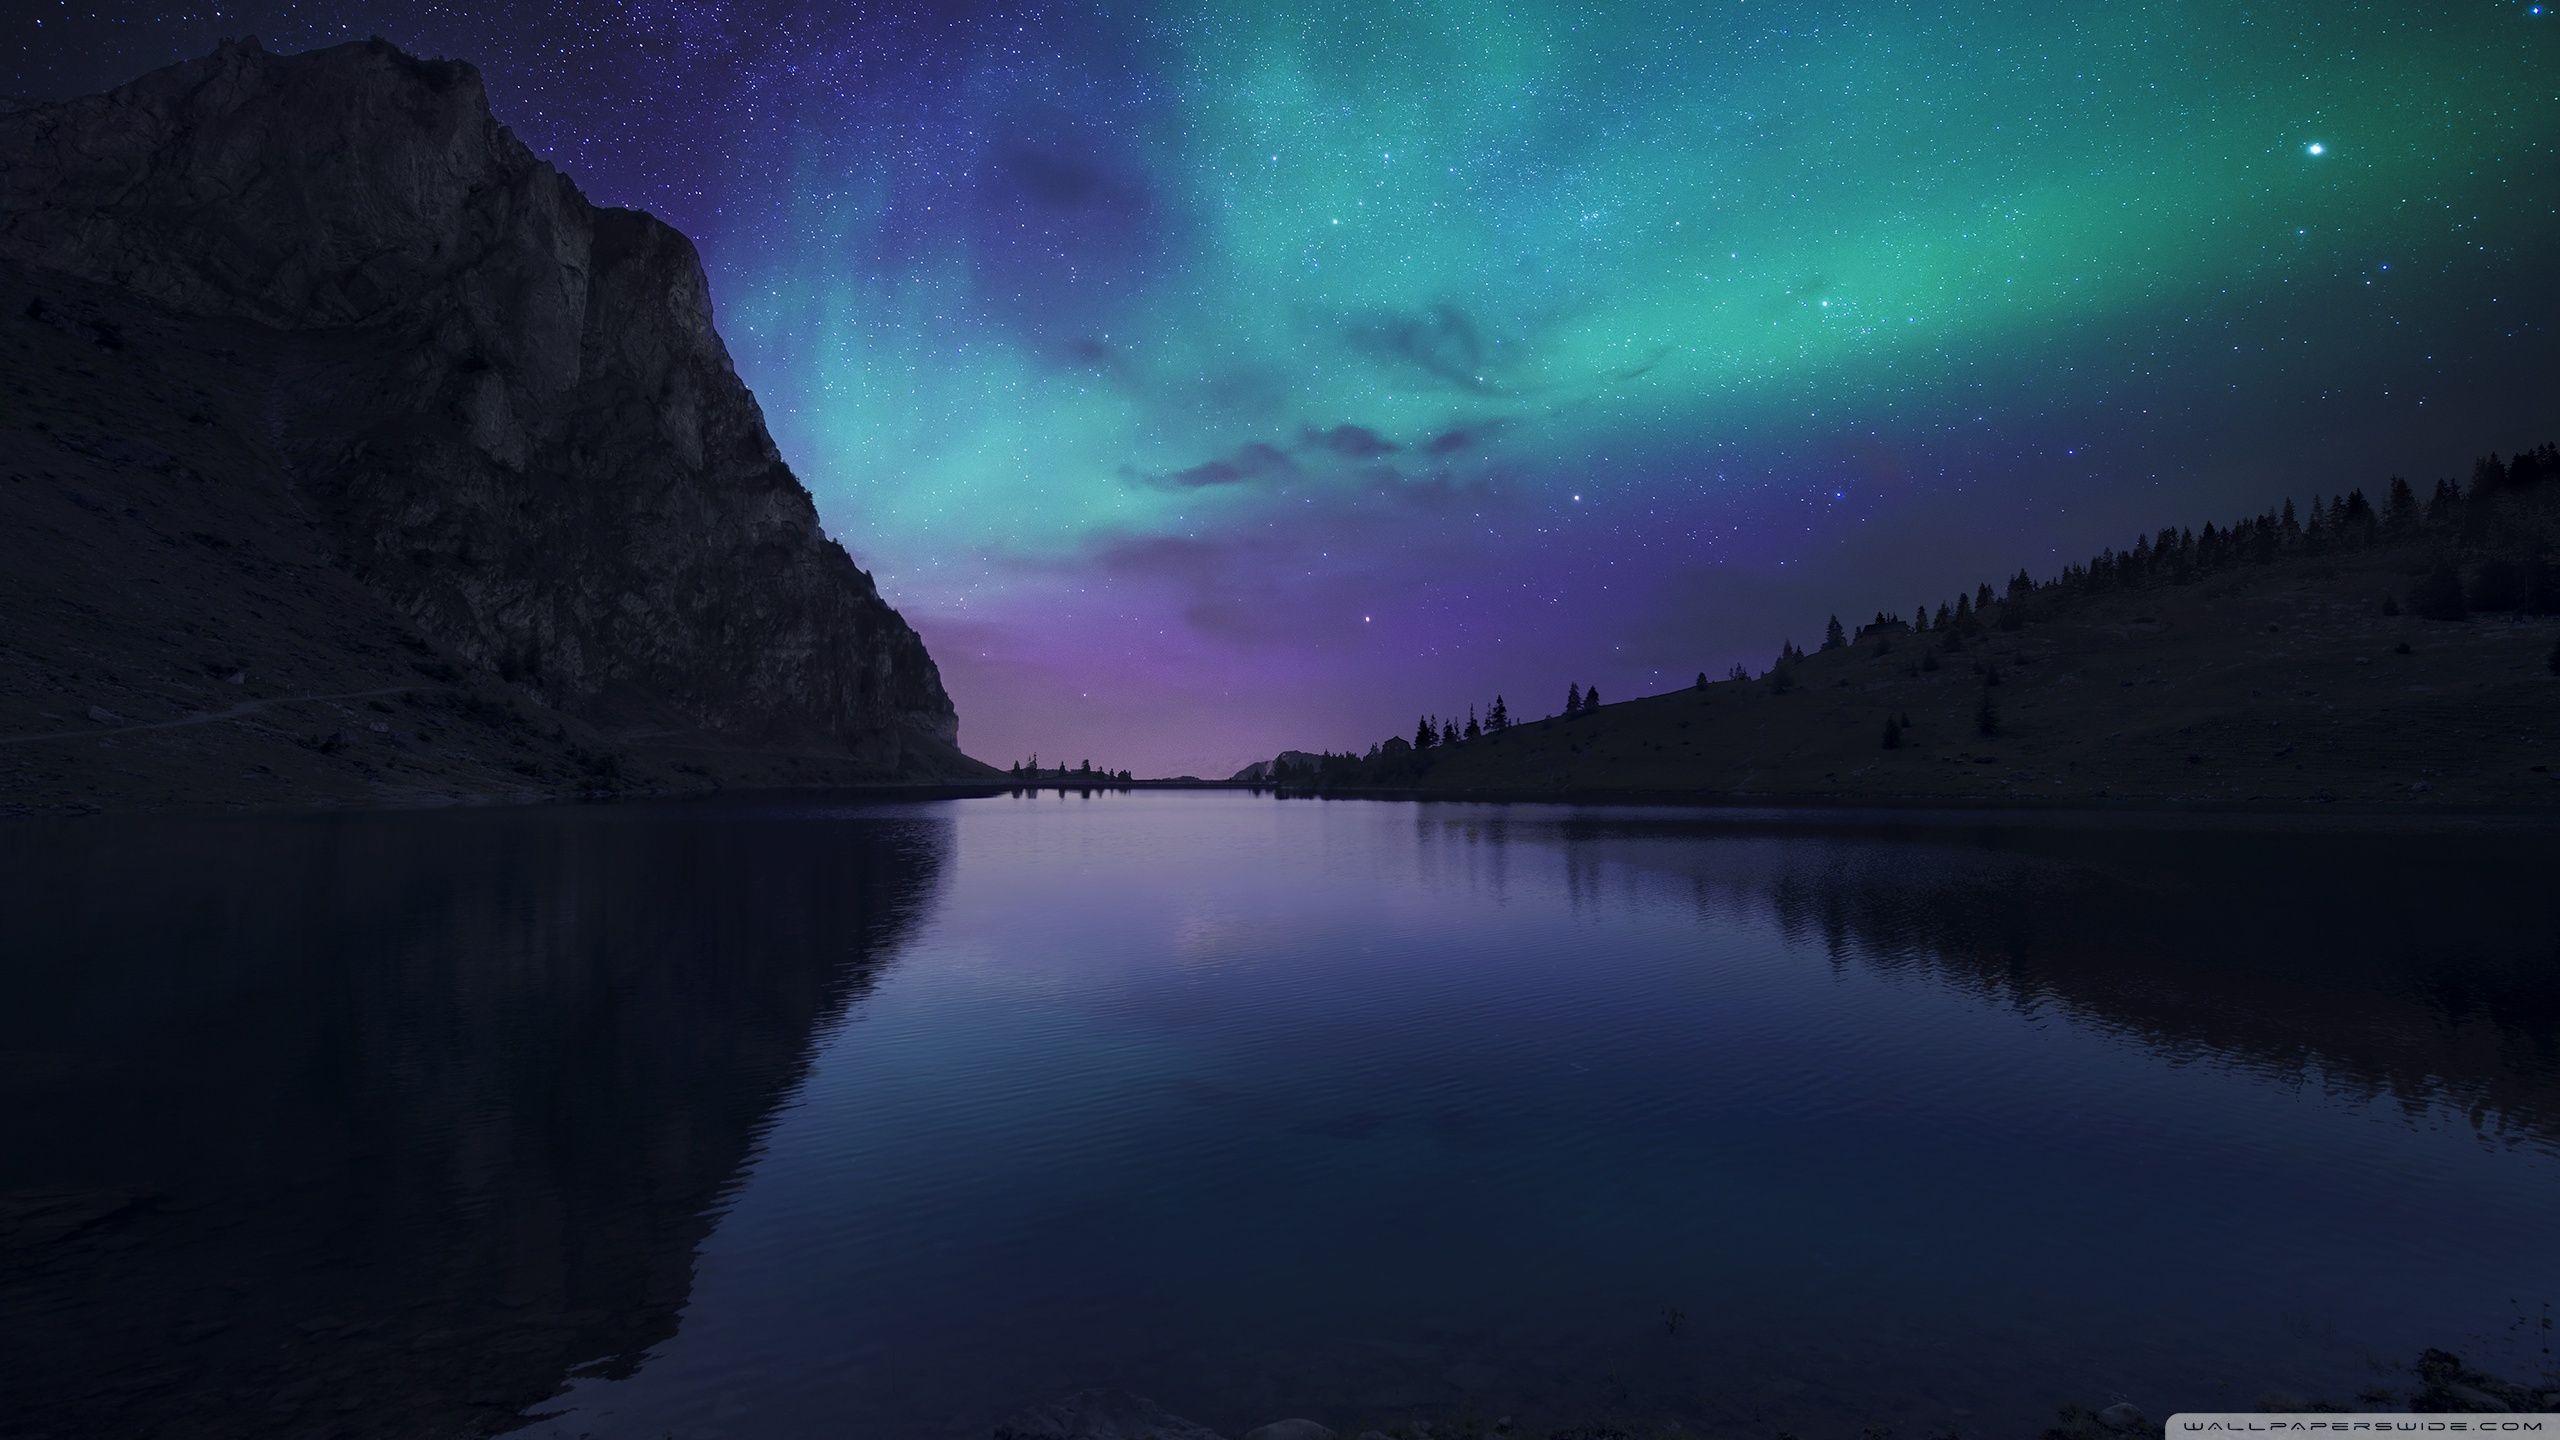 Aurora Desktop Wallpapers Top Free Aurora Desktop Backgrounds Wallpaperaccess